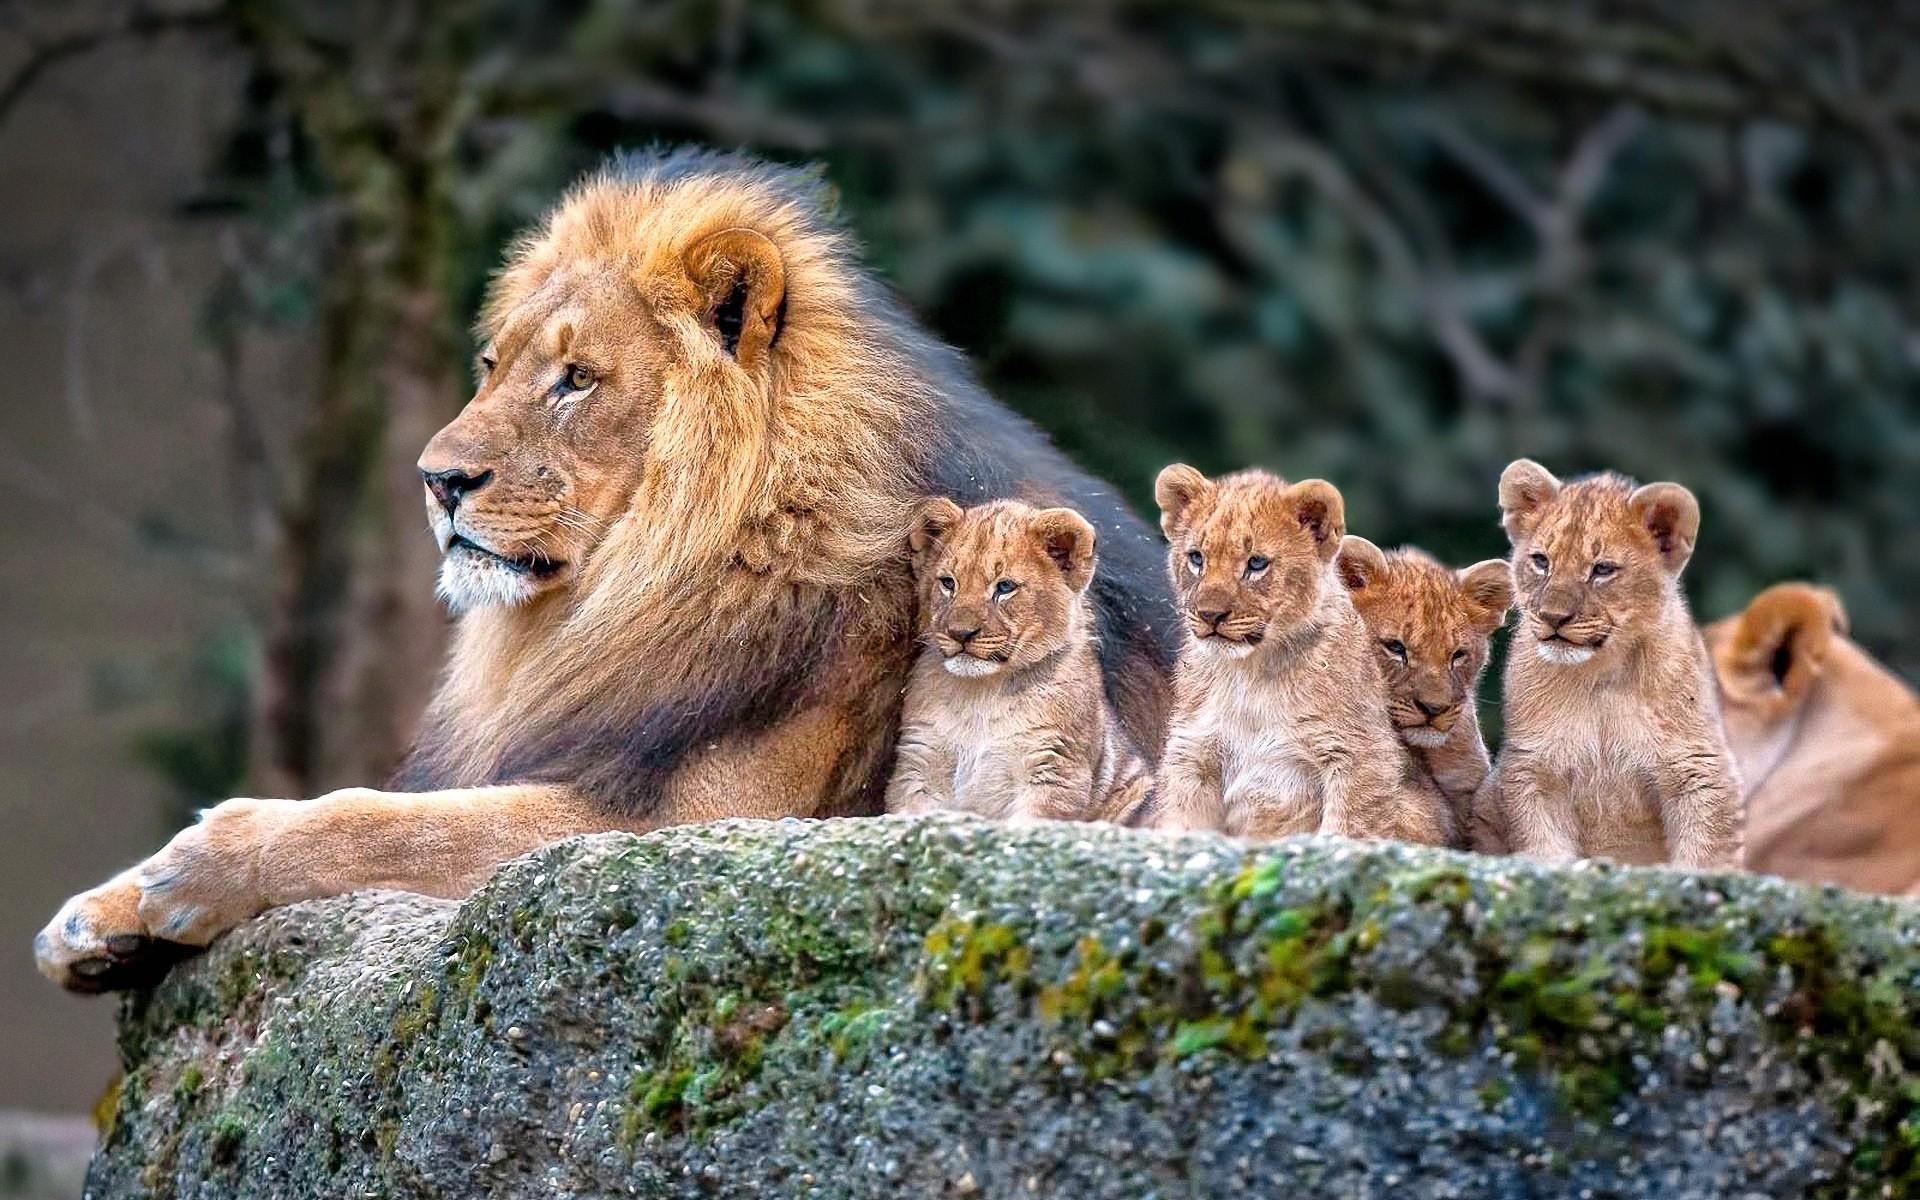 ЛЕВ СМЕЁТСЯ онлайн Animals___Wild_cats_Lion_guarding_her_brood_104086_